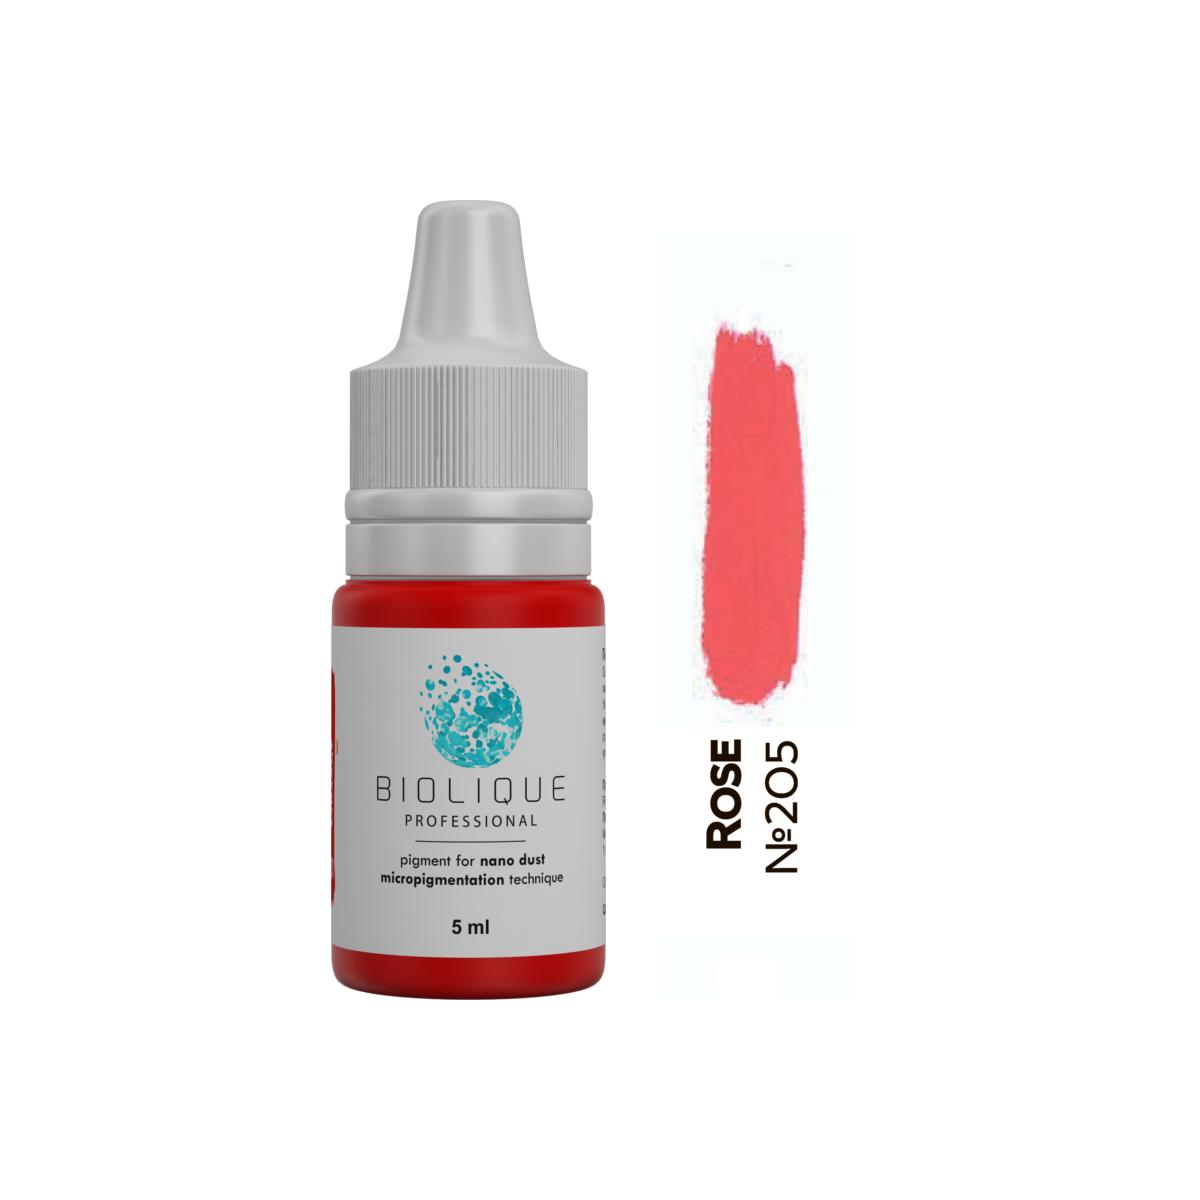 Biolique Professional ROSE 5 ml Makijaż permanentny